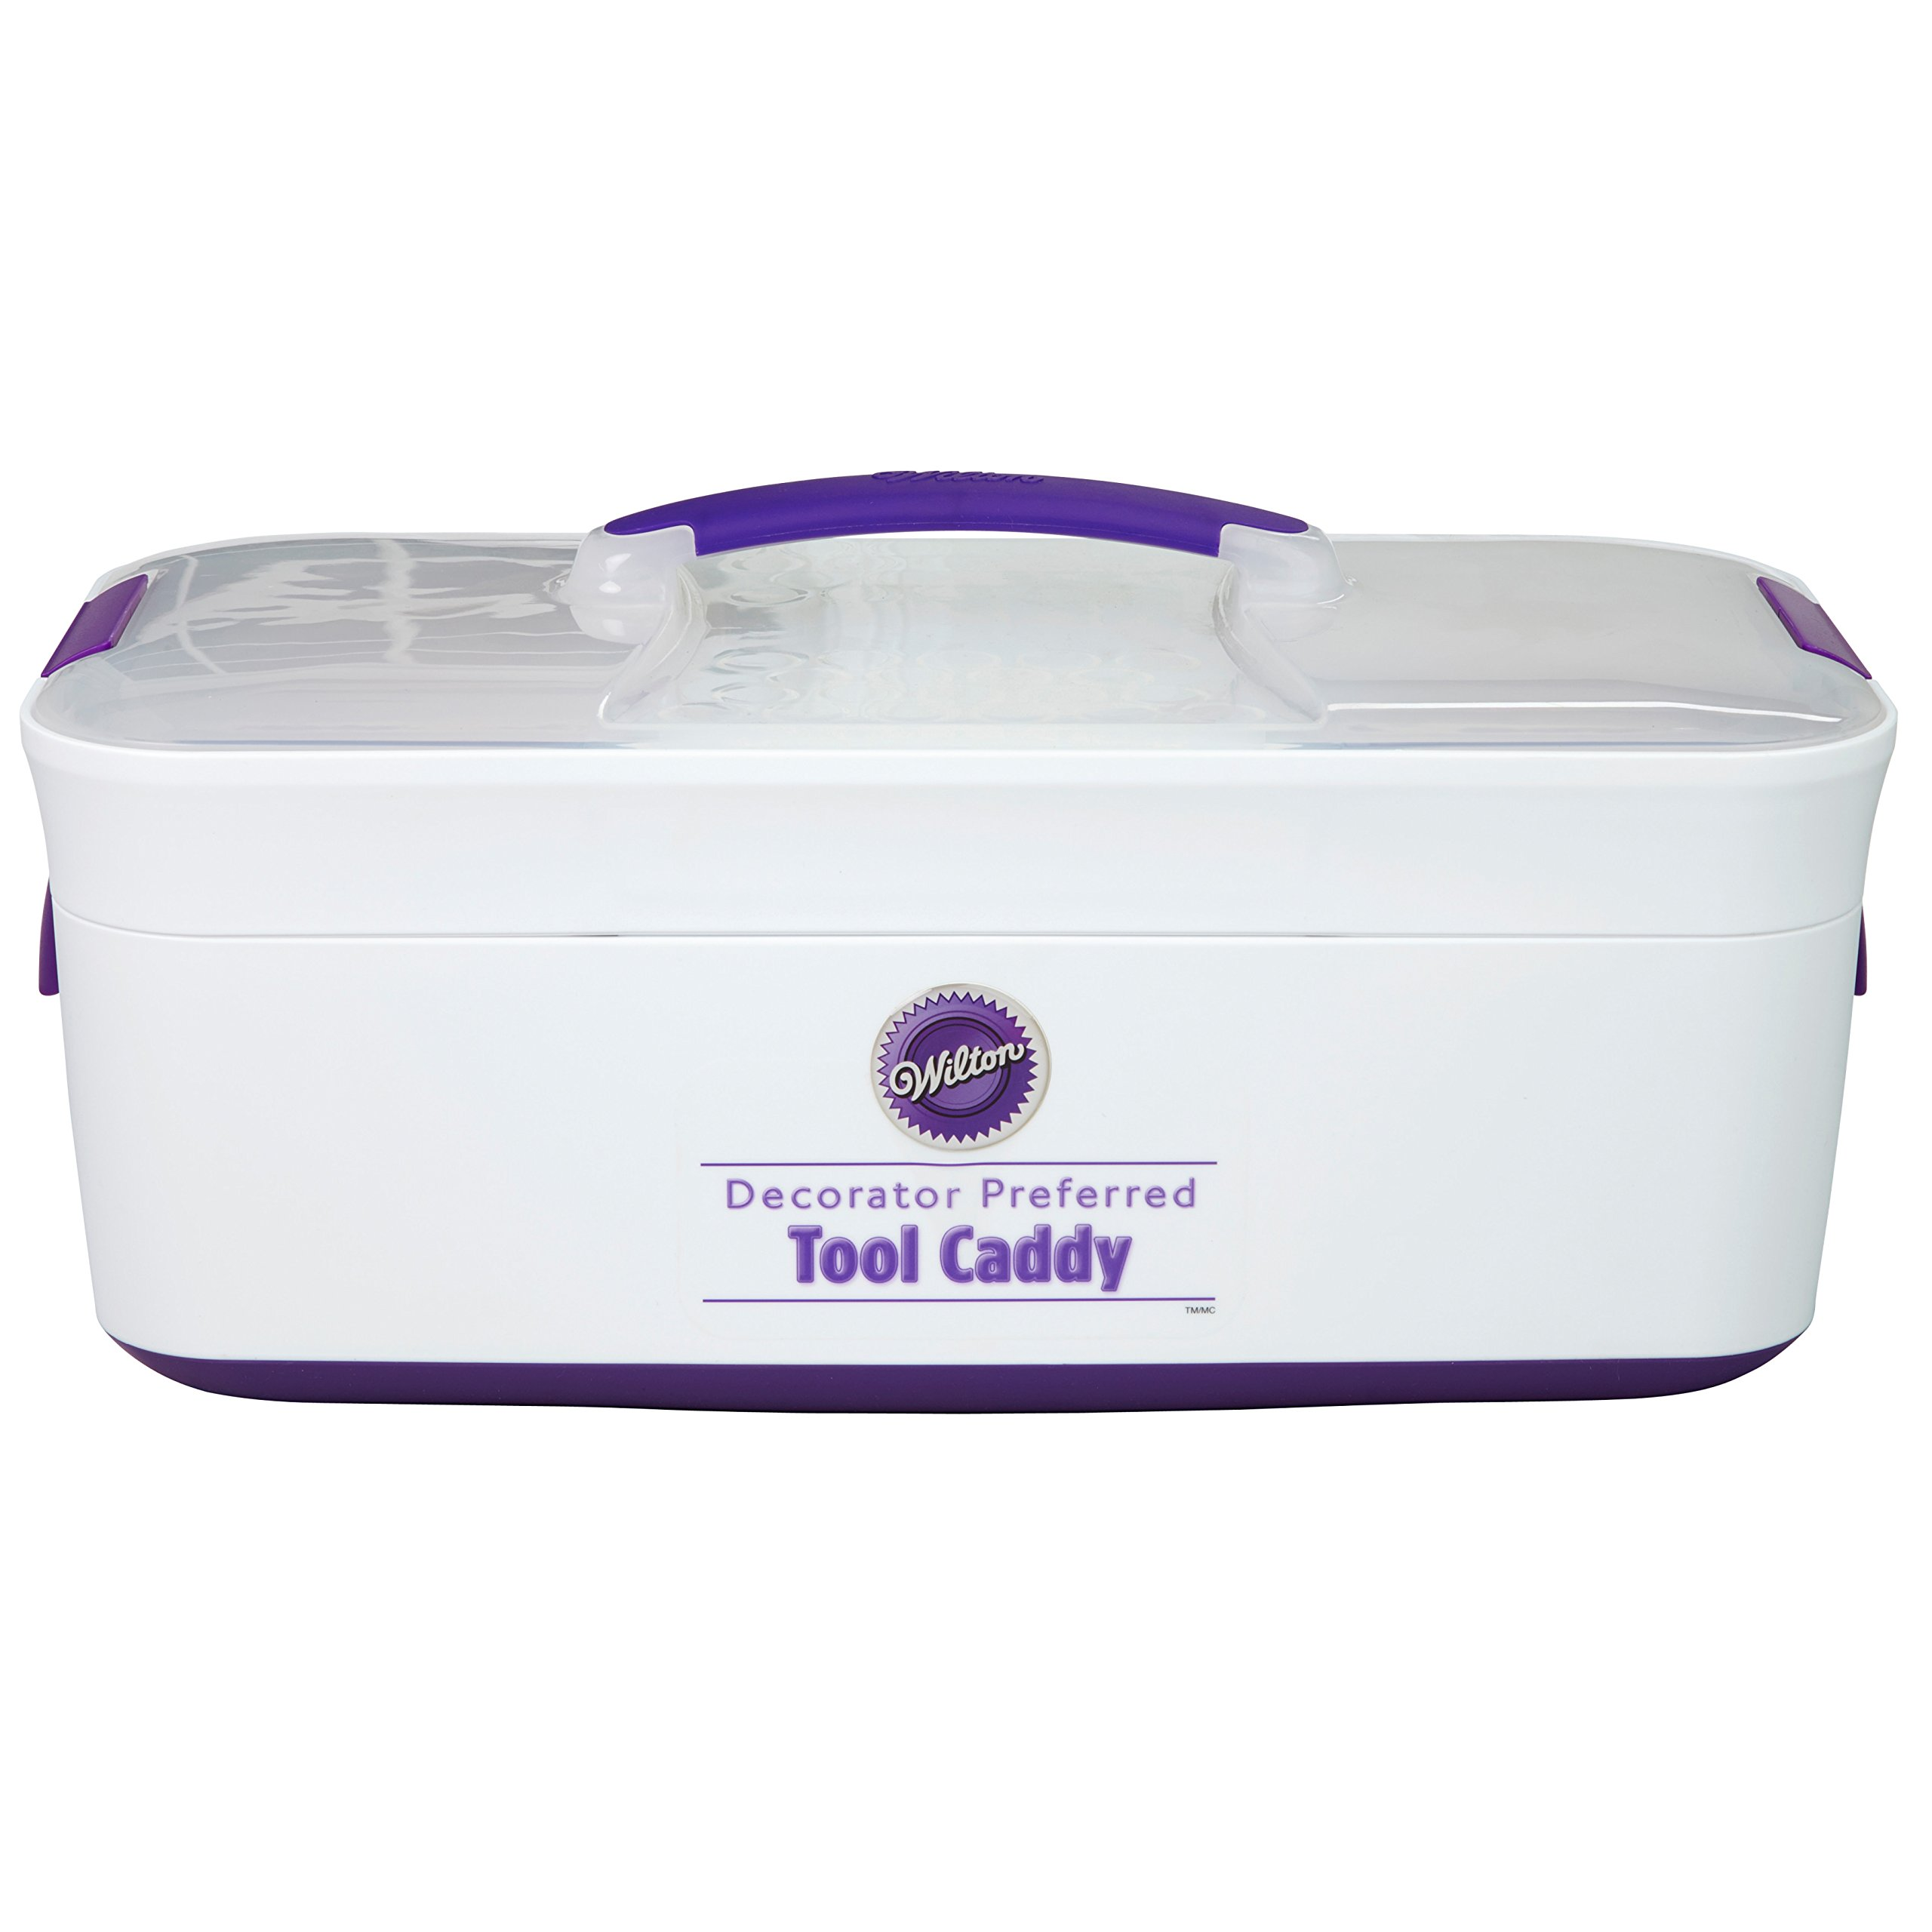 Wilton Decorator Preferred Cake Decorating Tool Caddy